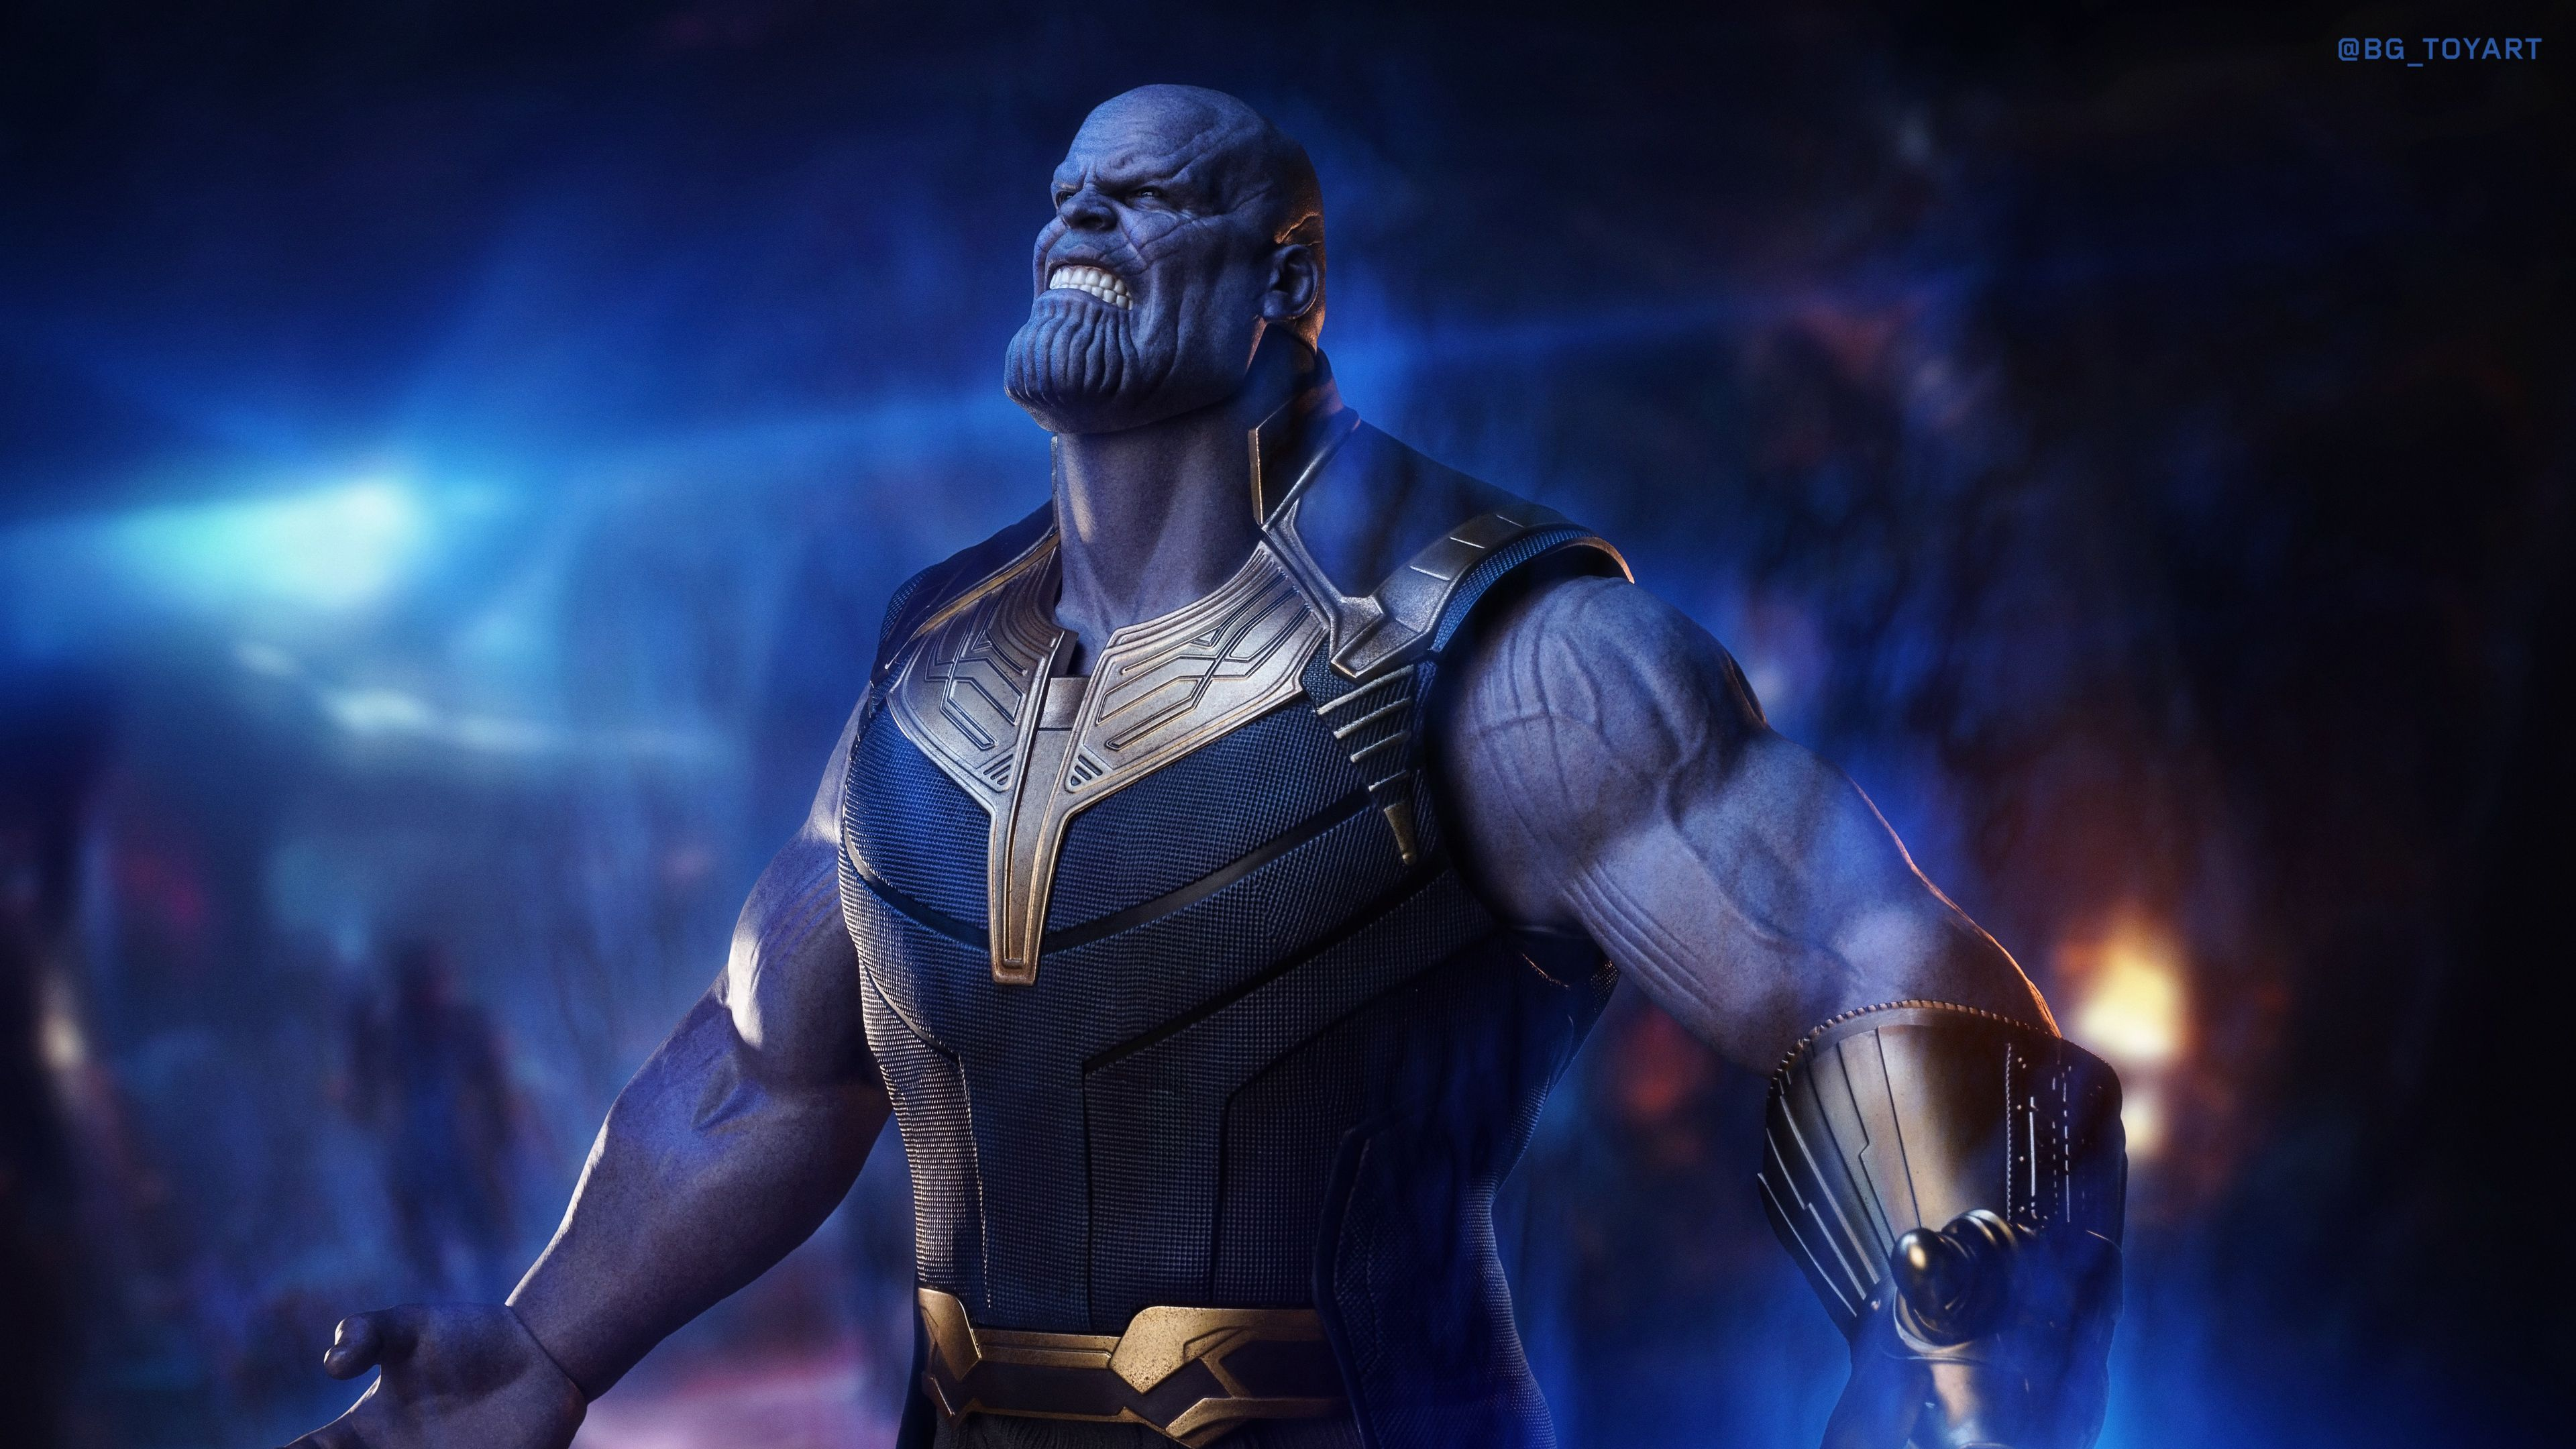 Thanos The Mad Titan 4k Thanos Wallpapers Superheroes Wallpapers Hd Wallpapers Digital Art Wallpapers Artwork Wallpape Superhero Hd Wallpaper Art Wallpaper